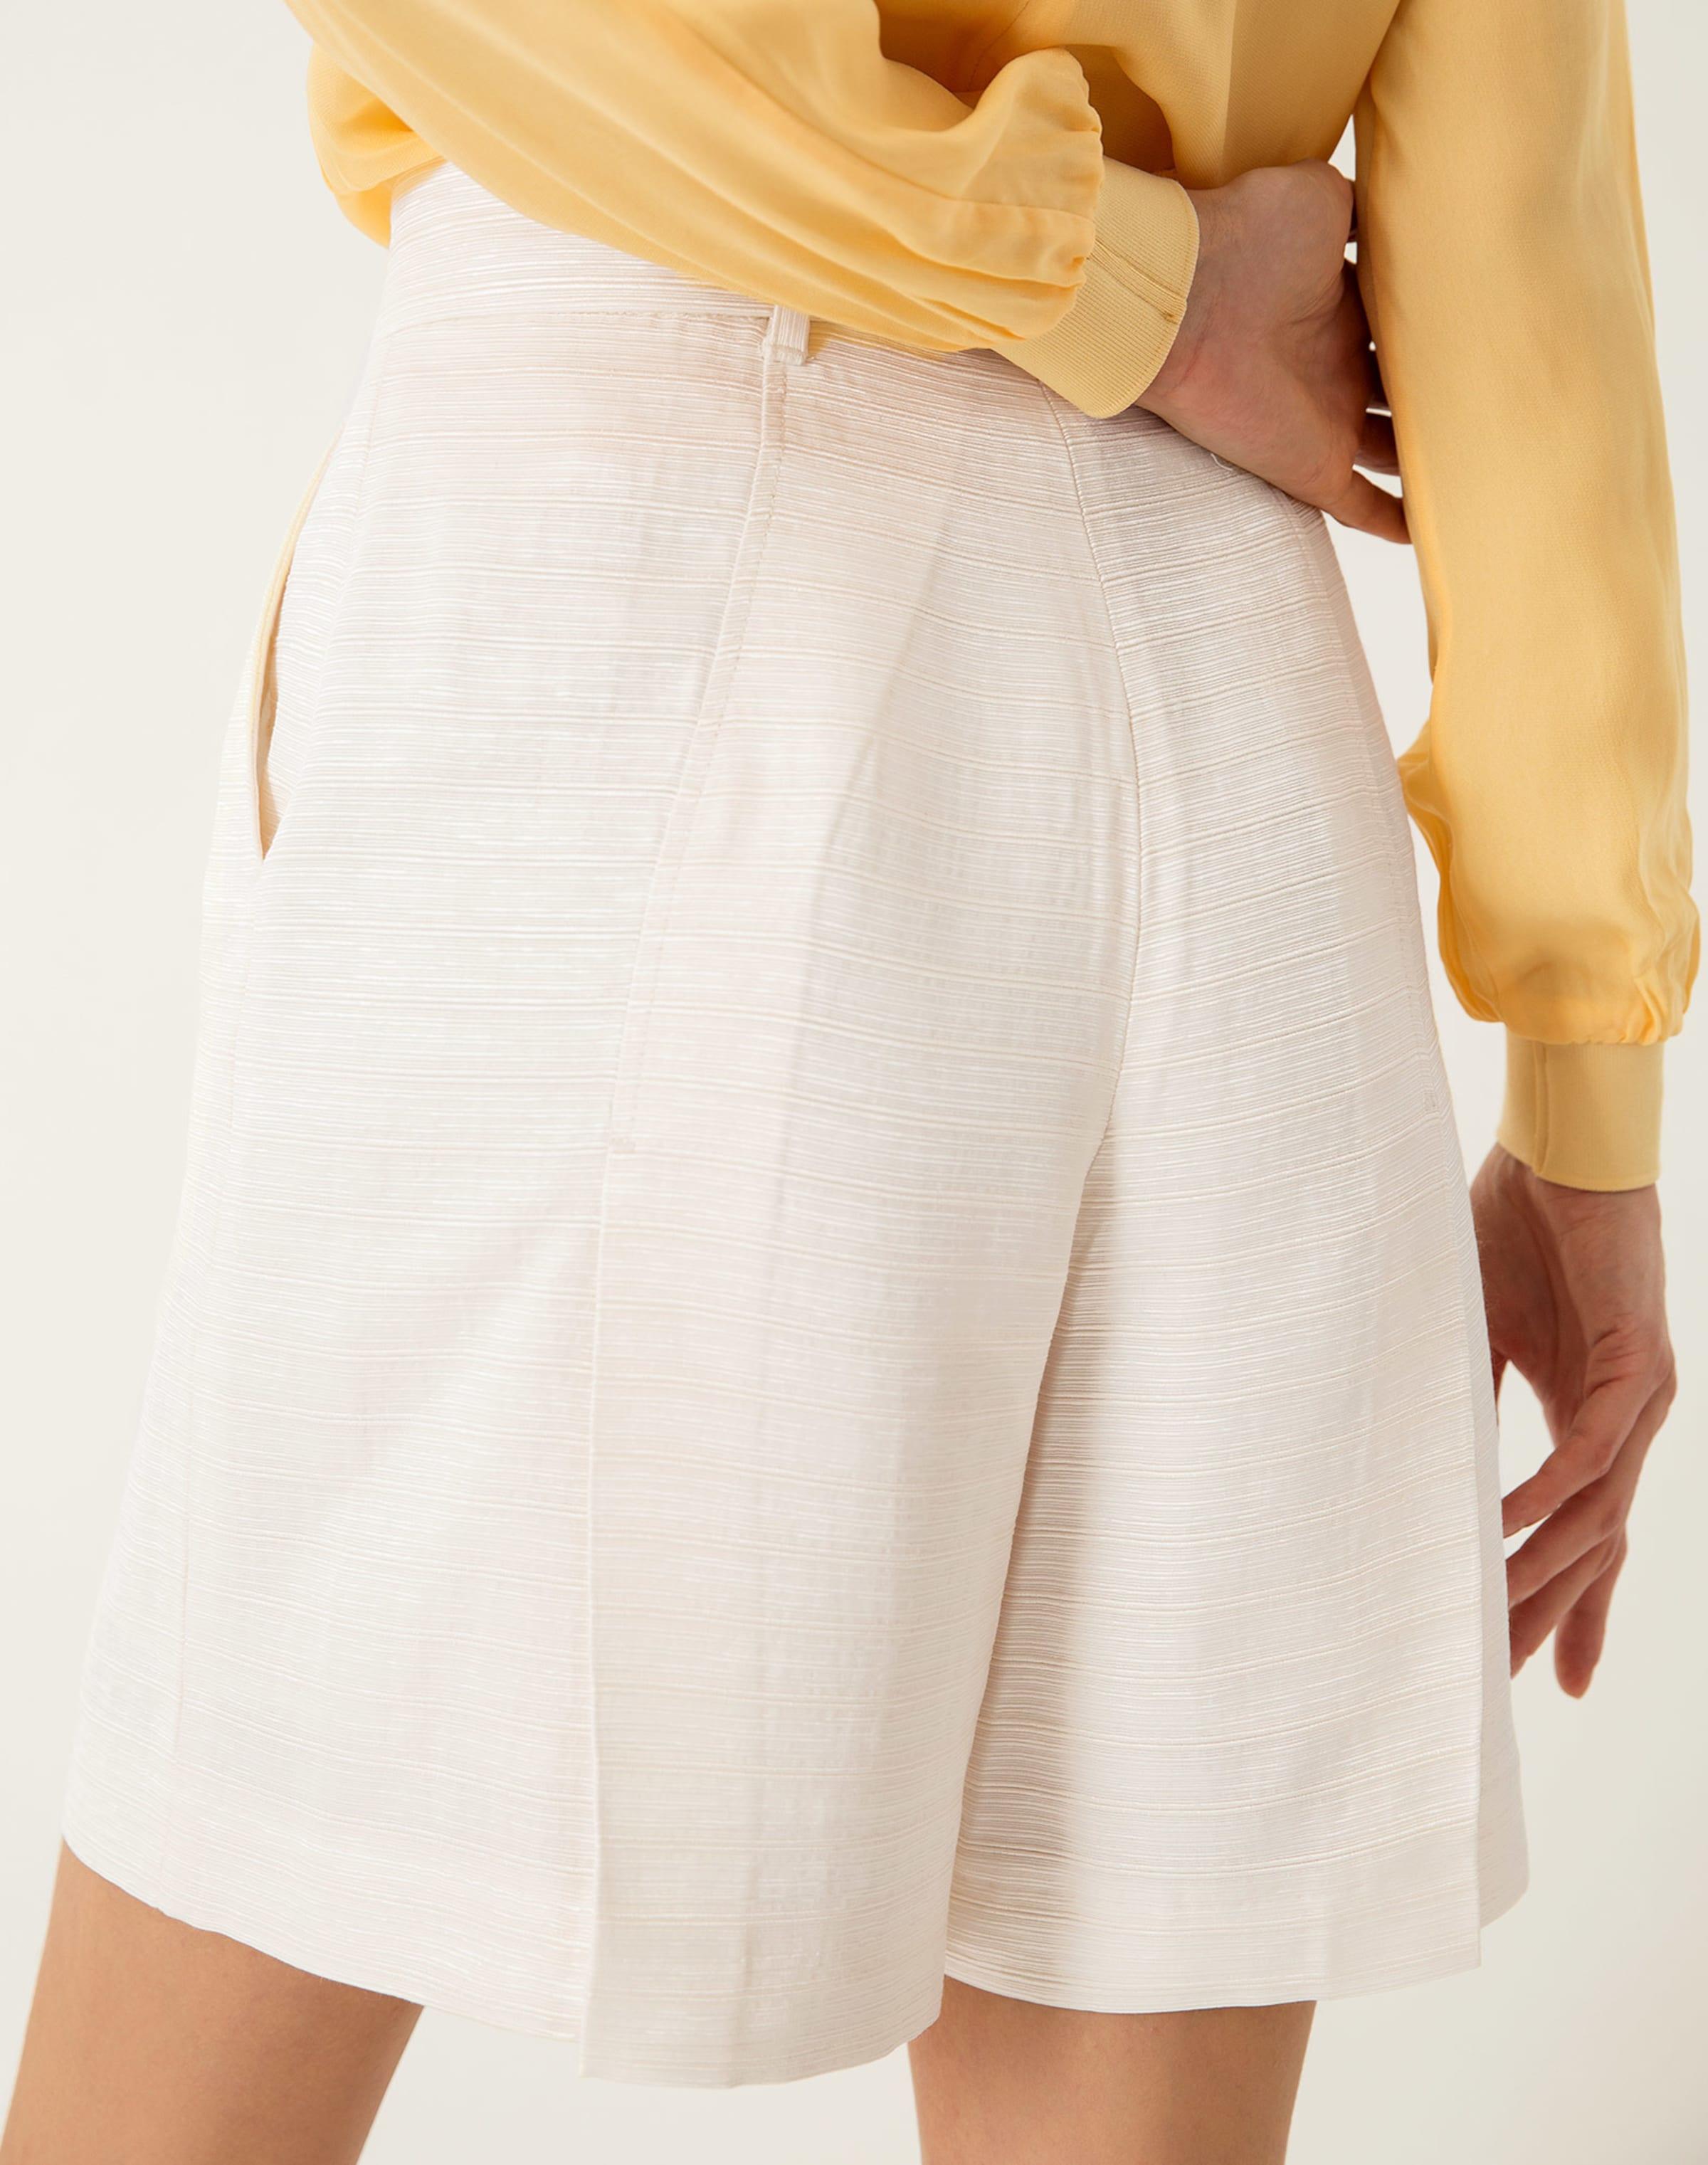 Weißmeliert Oak 'volume' In Shorts Ivyamp; IgmYb76yvf